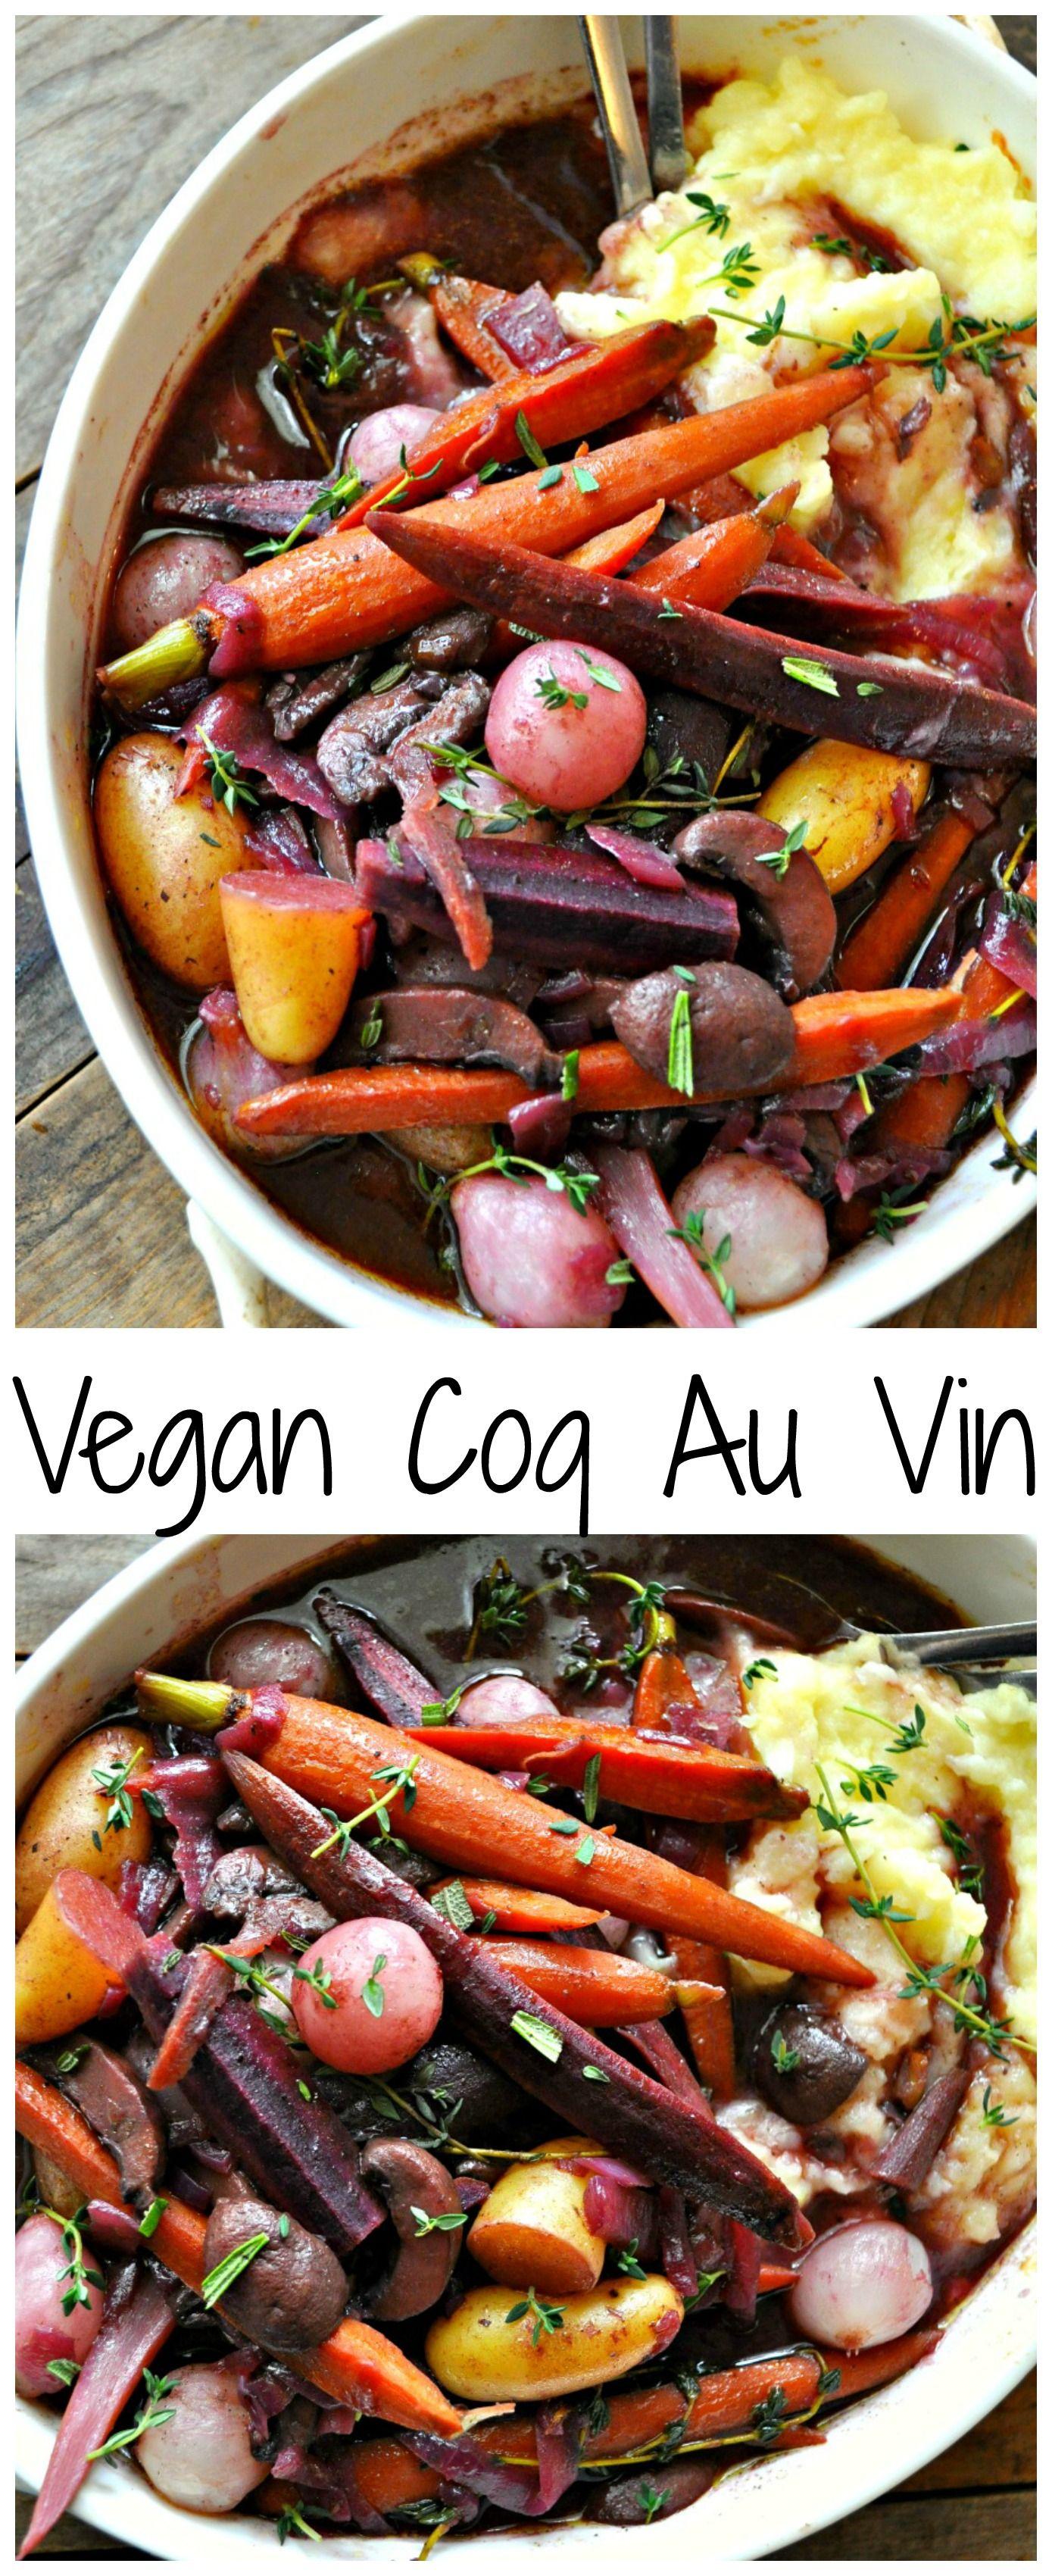 Vegan Coq Au Vin Recipe Healthy recipes, Vegan main